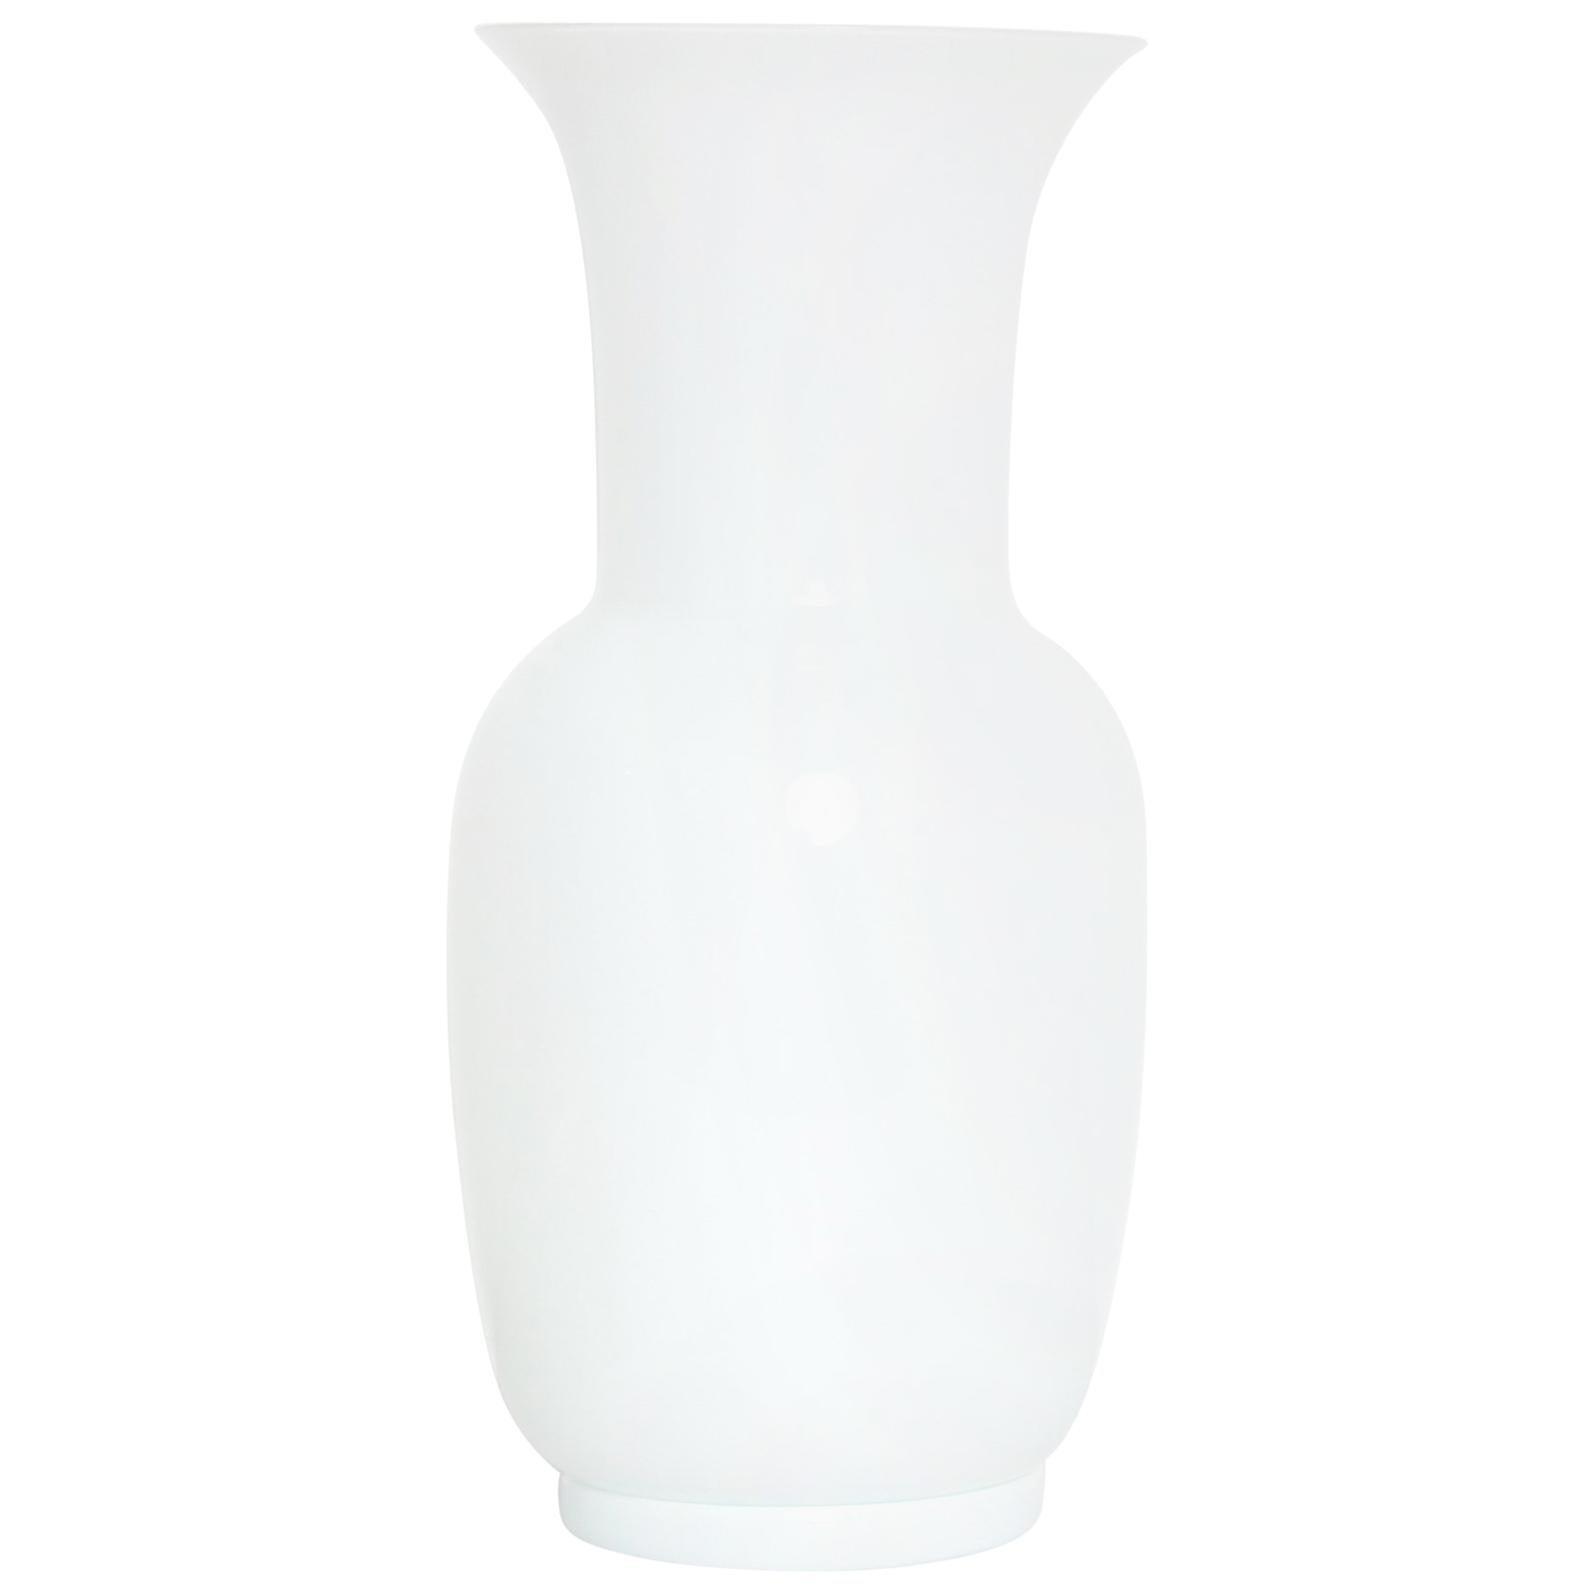 Italian Mid Century Modern Venini White Glass Vase by Tomaso Buzzi, 1983